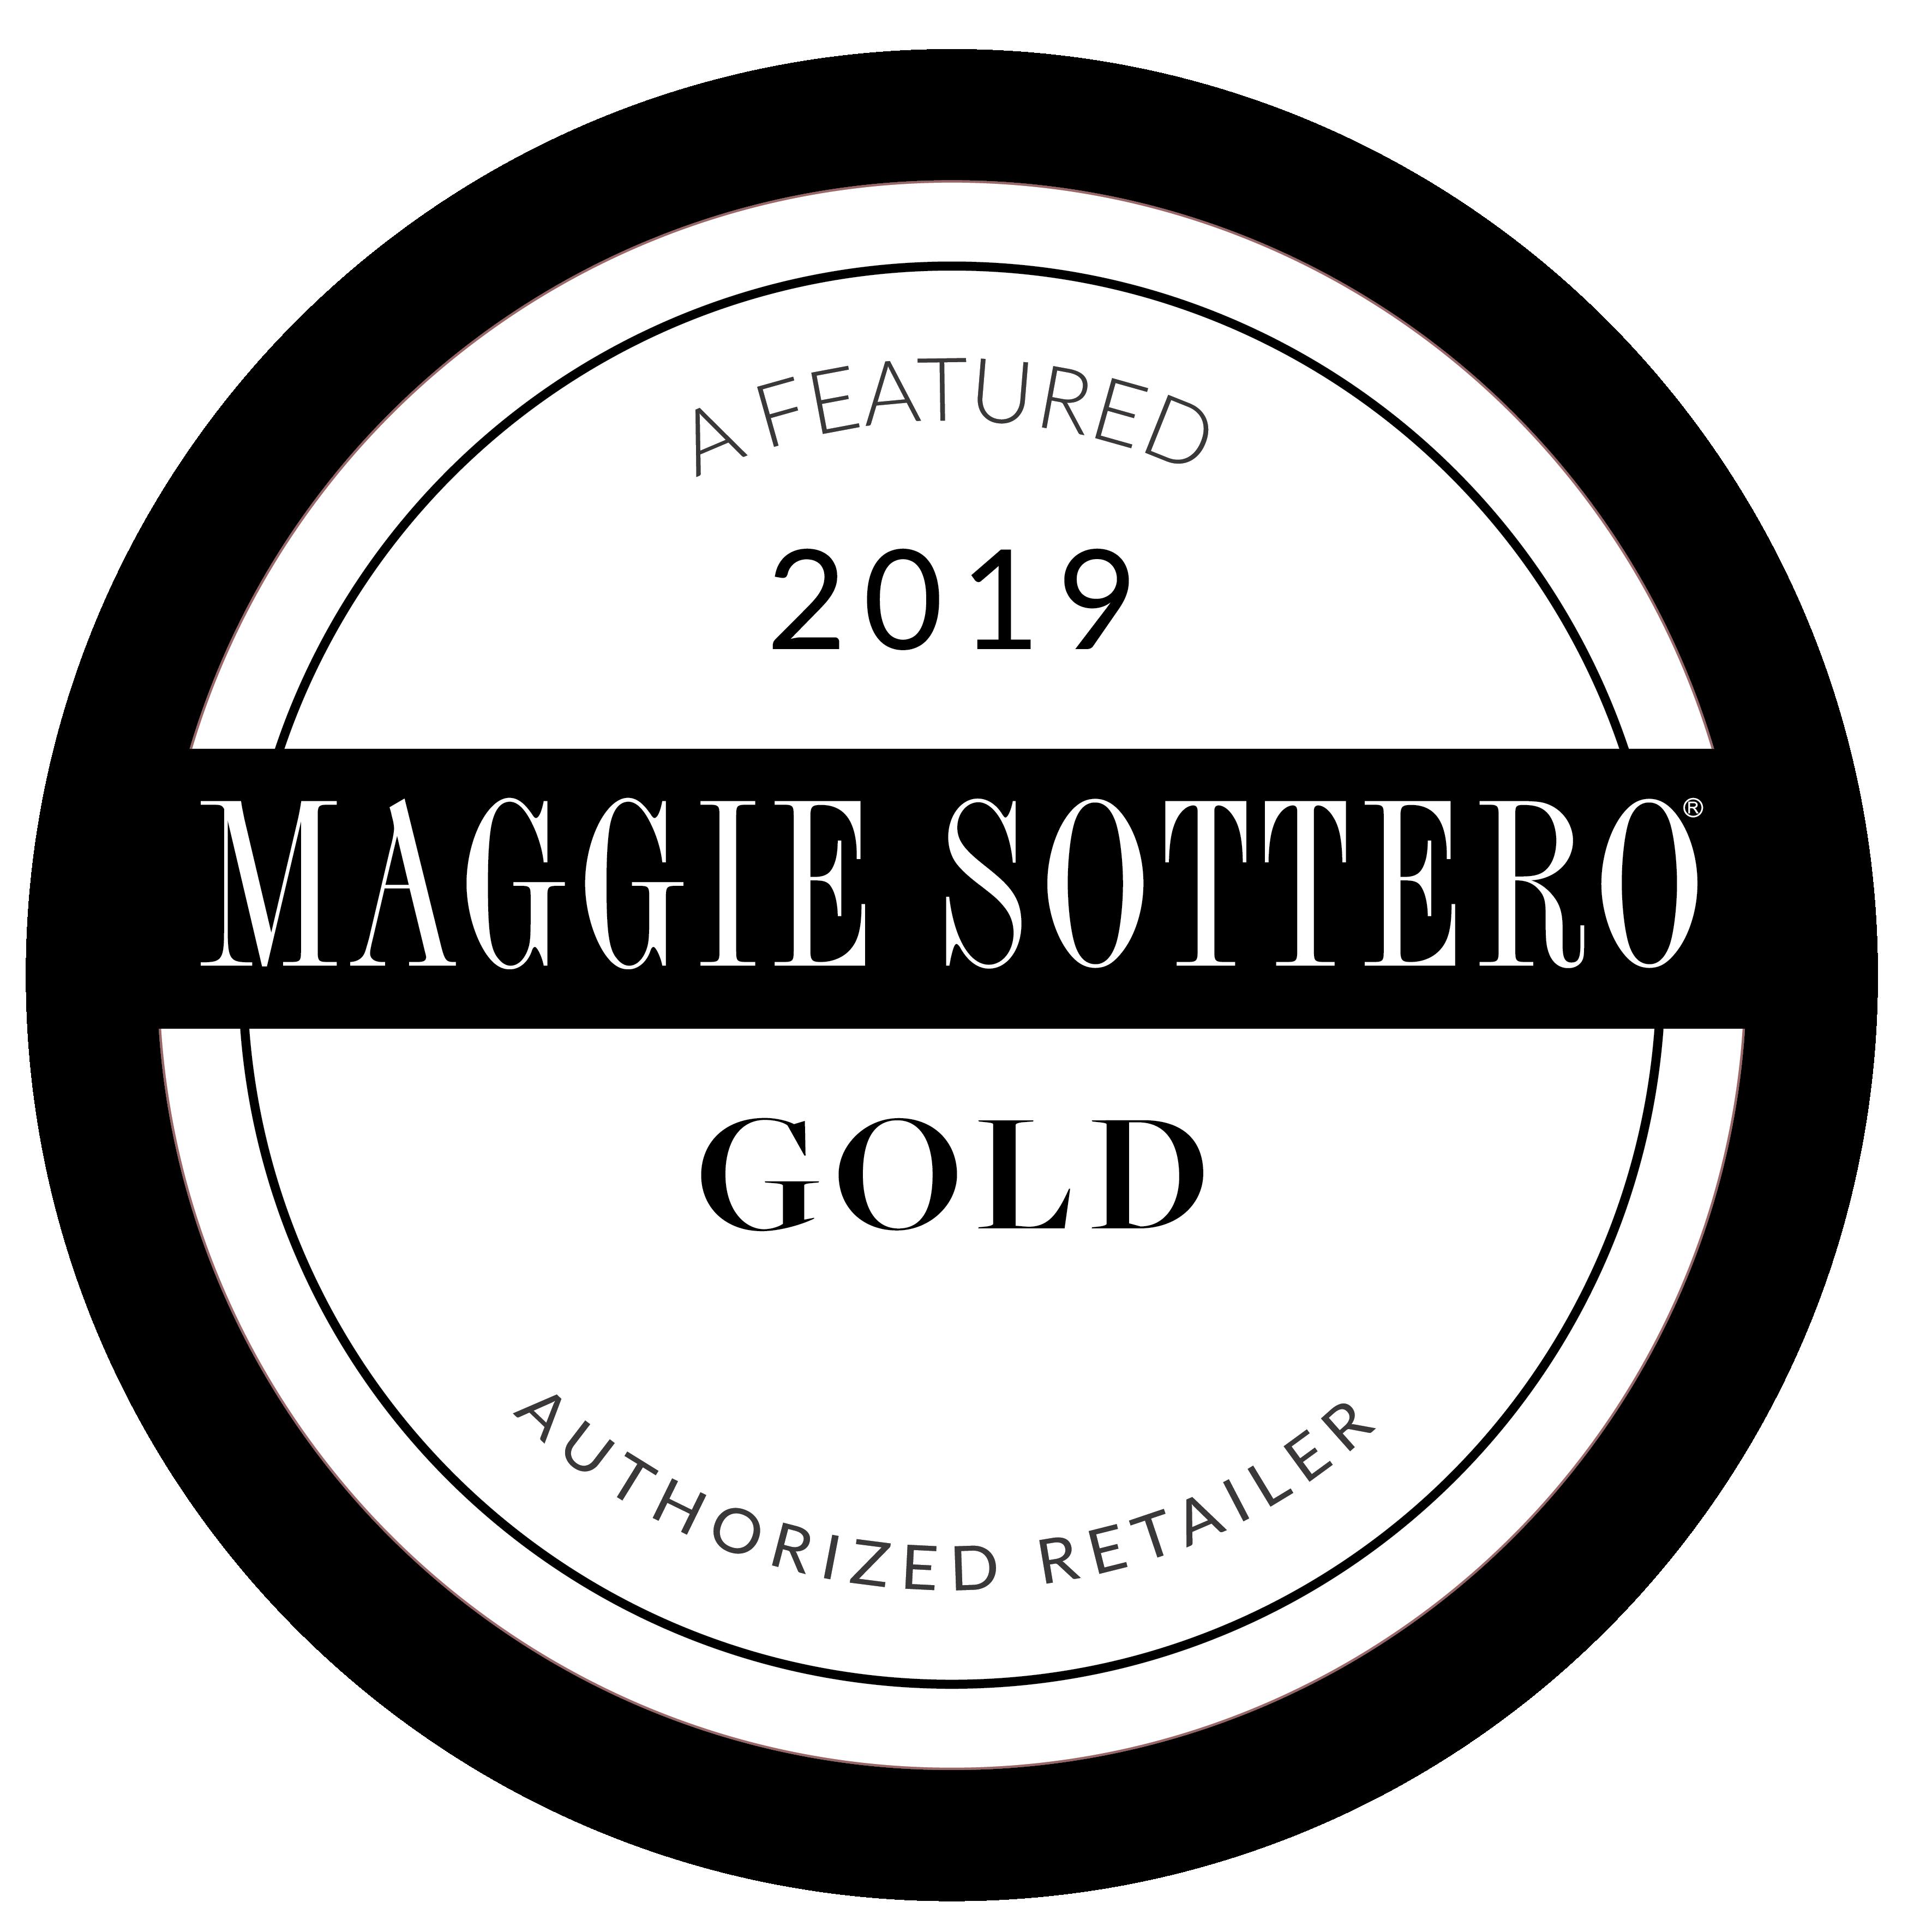 maggie sottero gold premier retailer